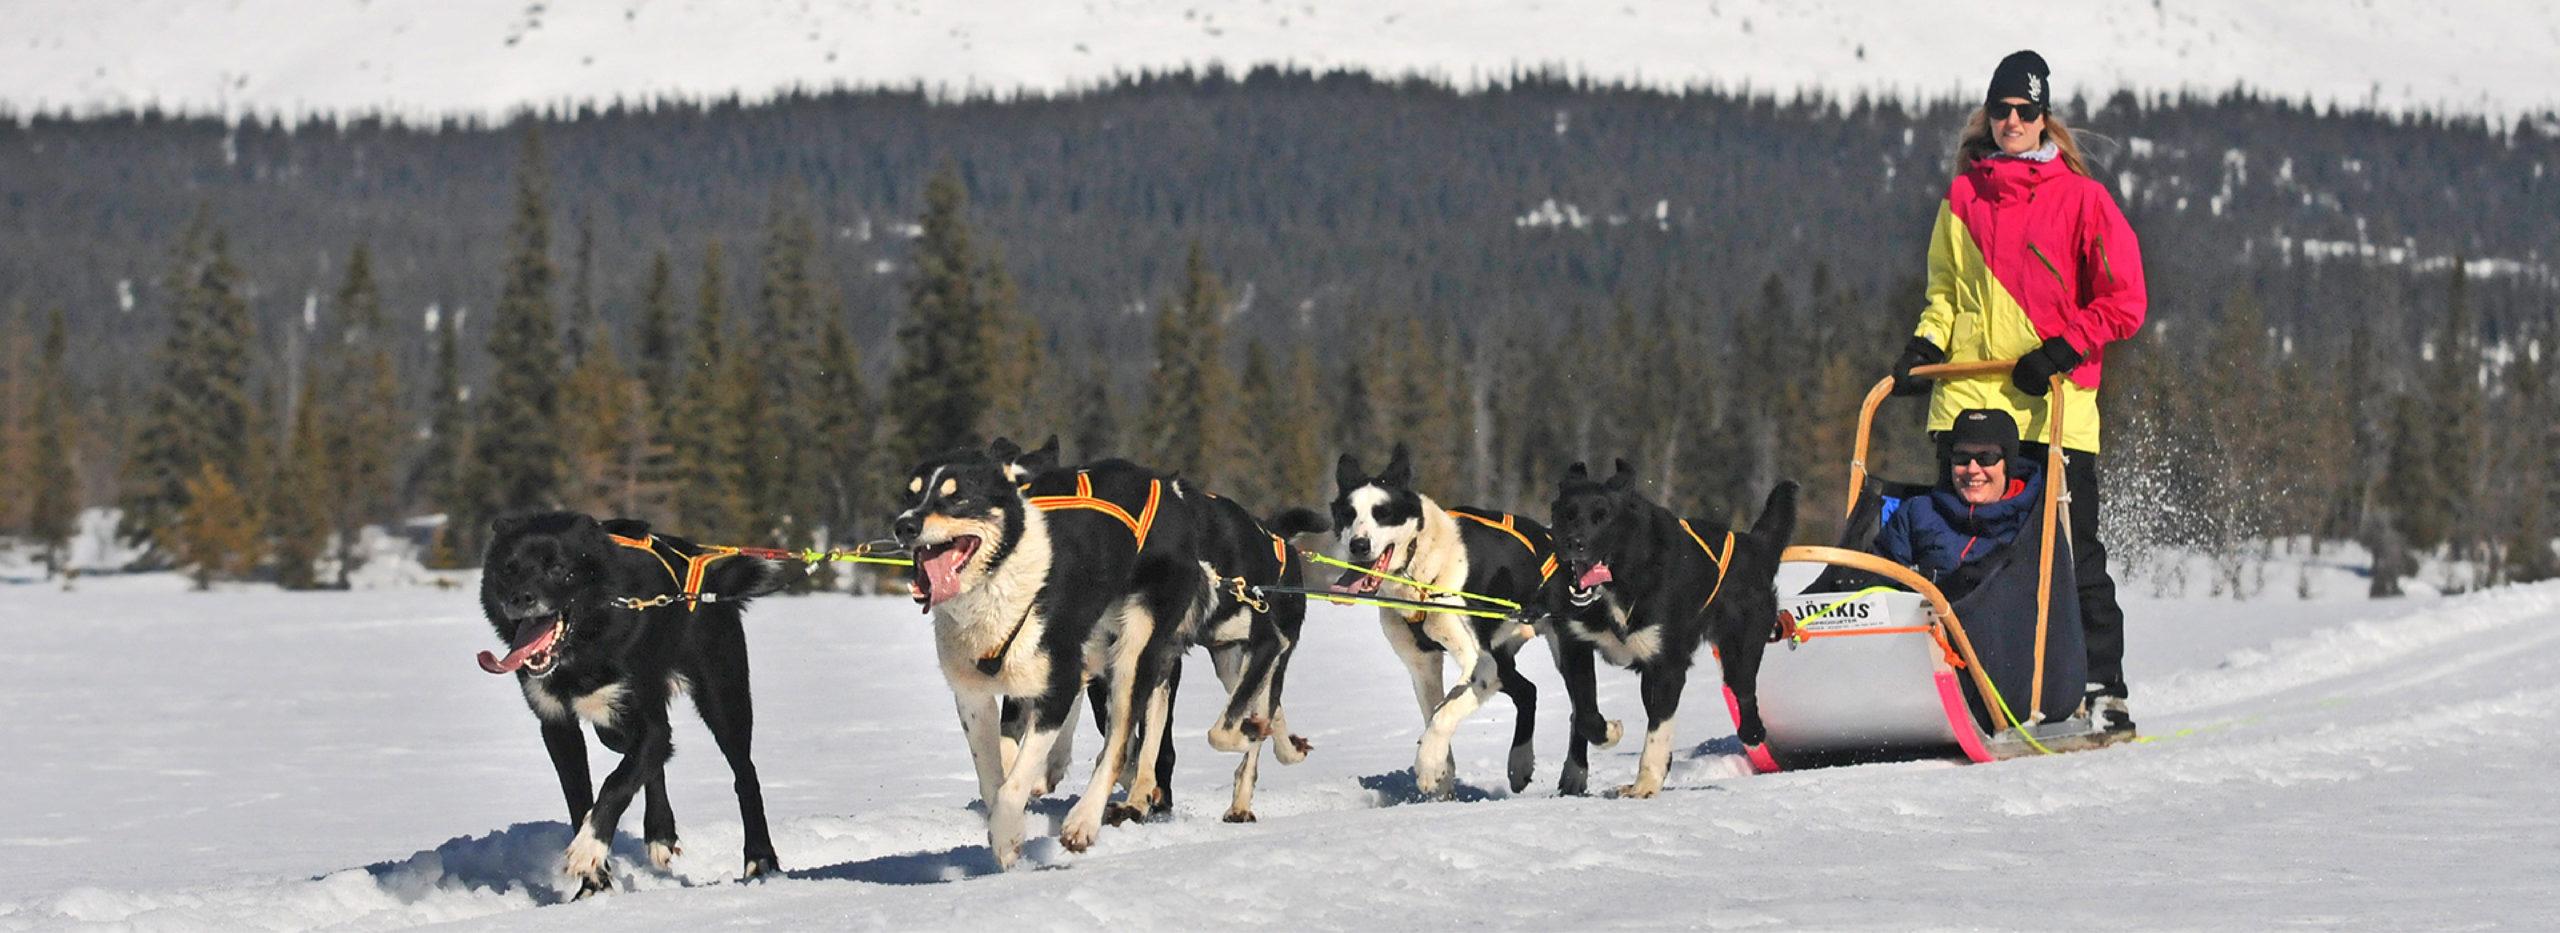 Couple on dog sledding in Trysil